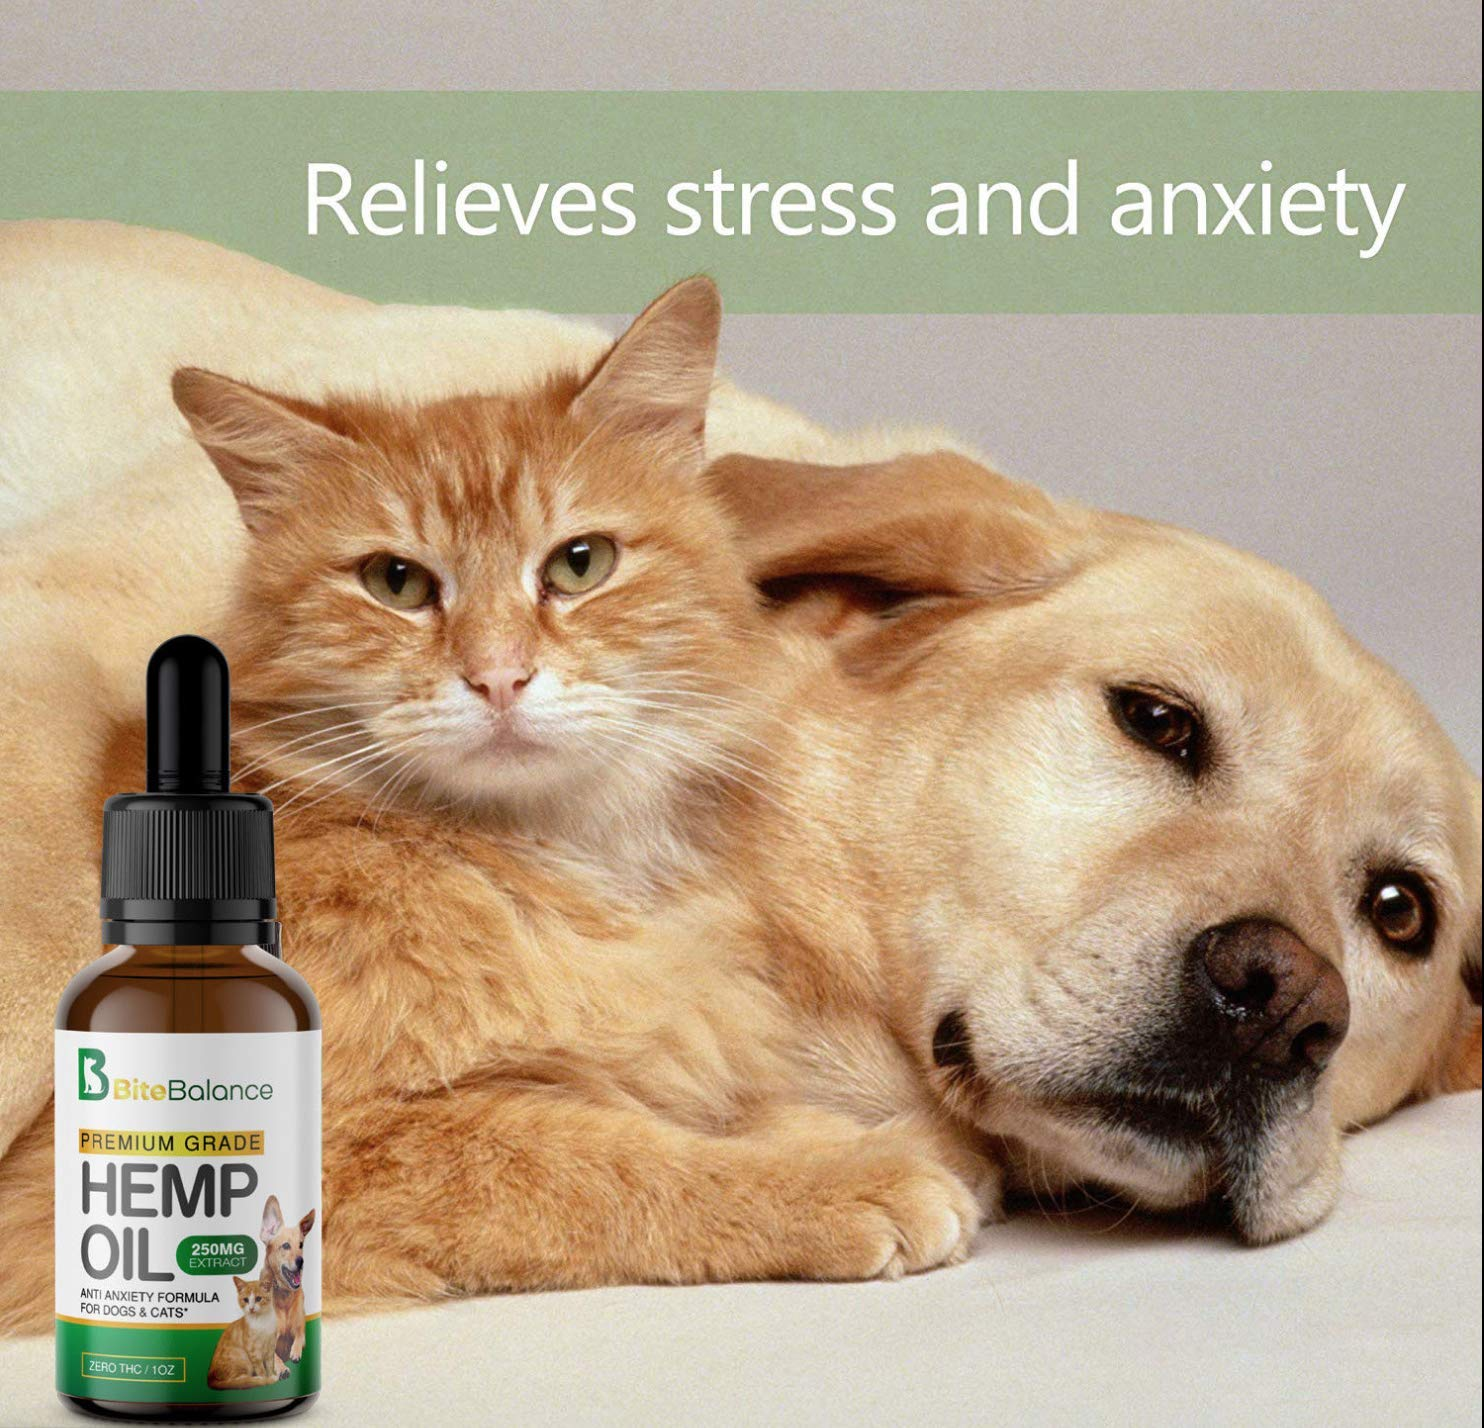 Hemp oil for cats - kattengekte.com, 71yHDgZHy L